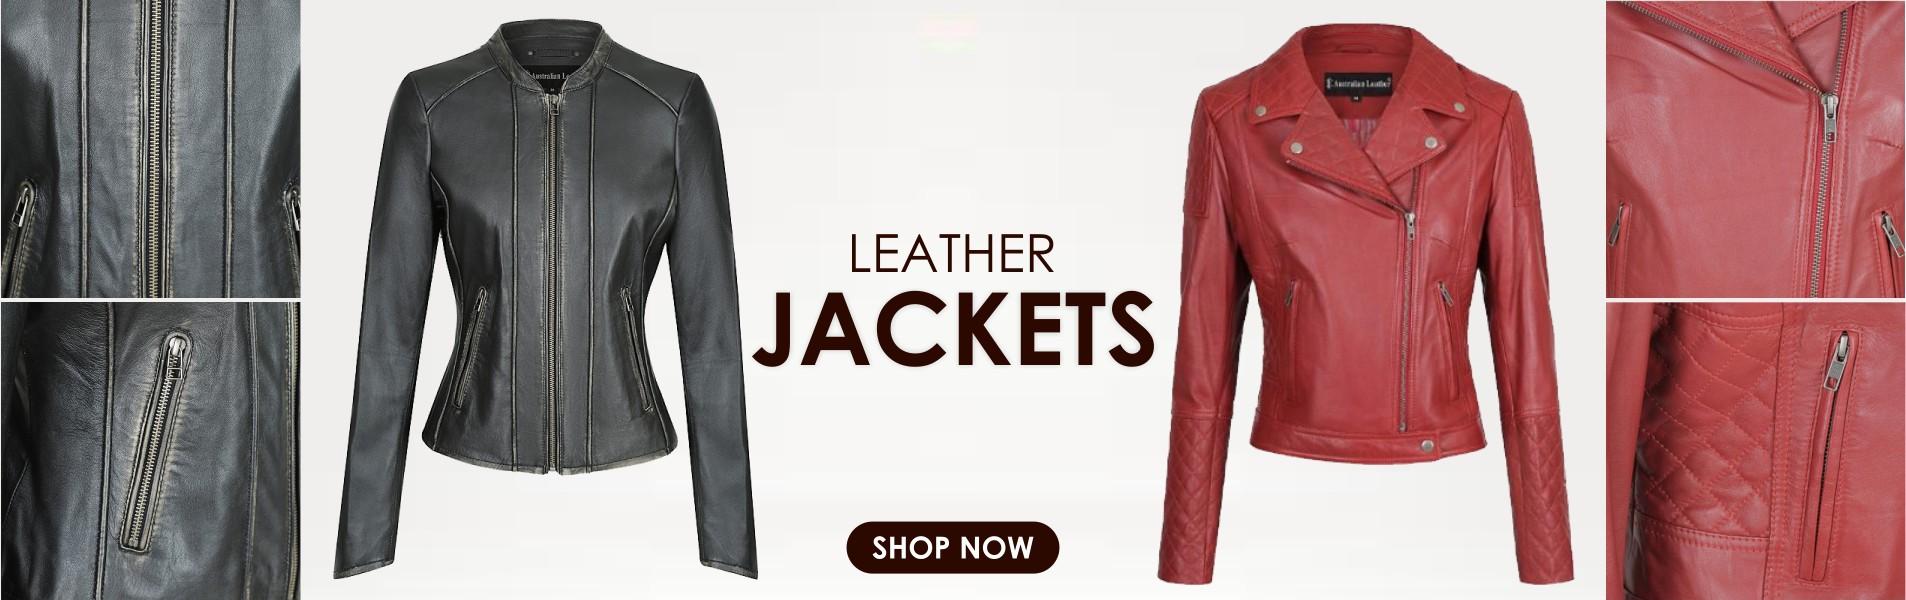 leather-jackets-bikie-jackets-australian-made-slide